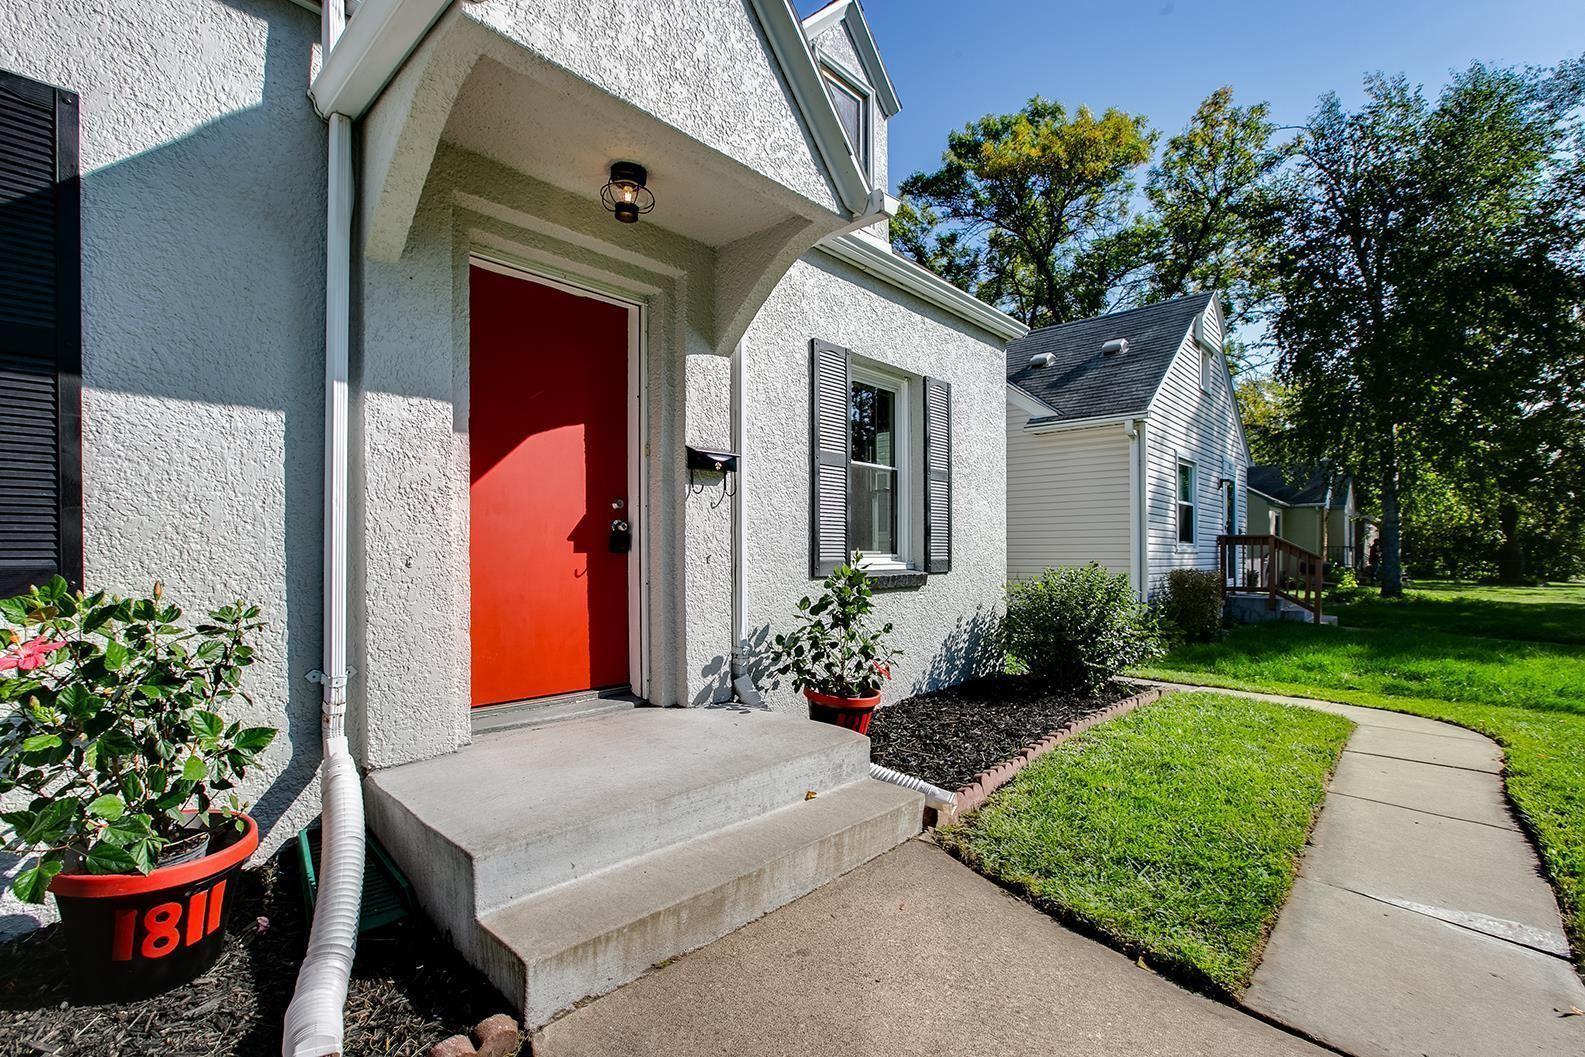 Photo of 1811 Bush Avenue E, Saint Paul, MN 55119 (MLS # 6102238)